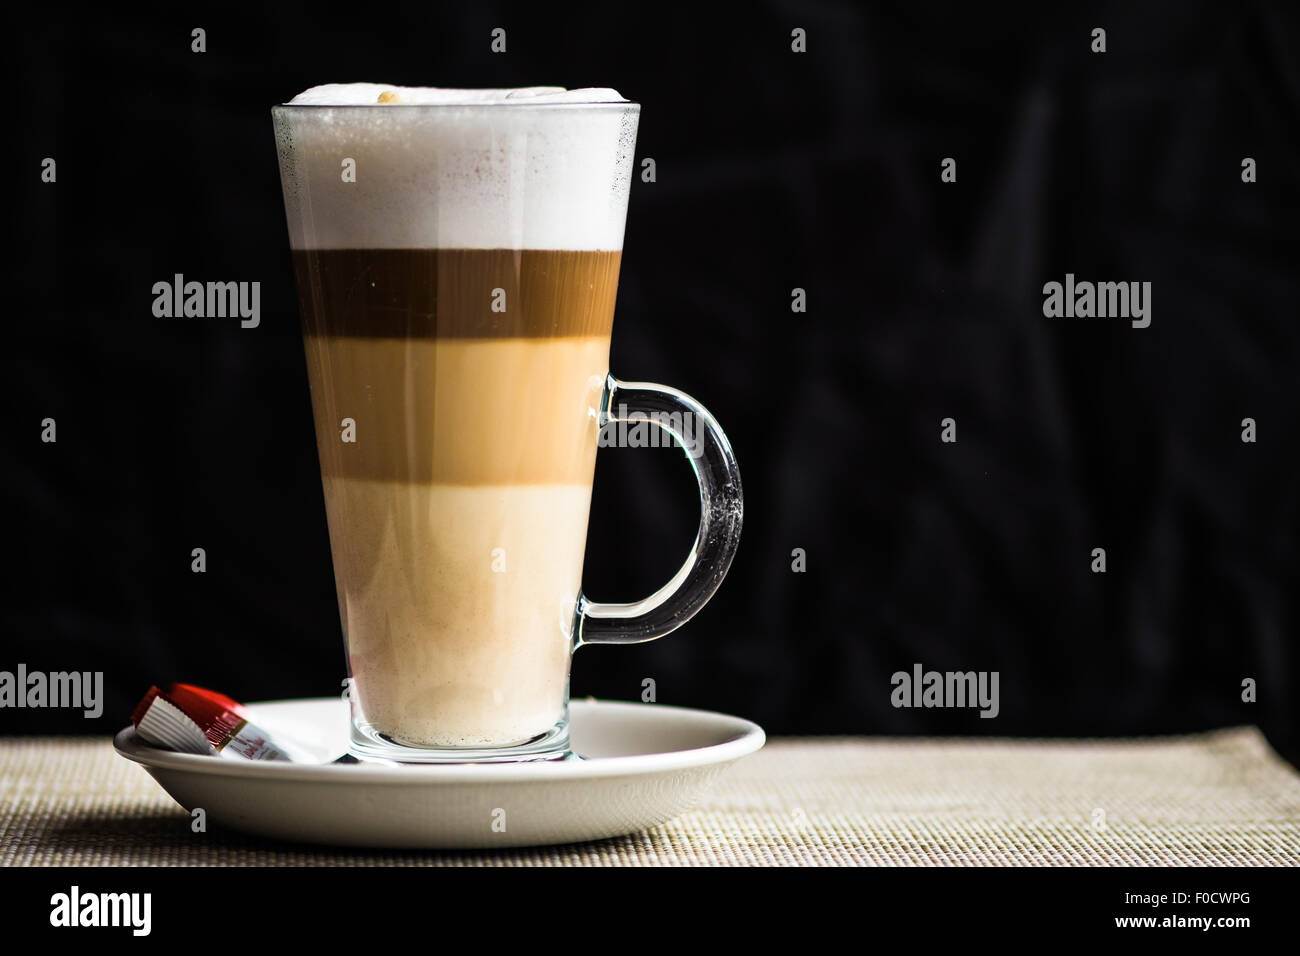 Layered Latte Coffee In A Glass Mug Stock Photo Alamy